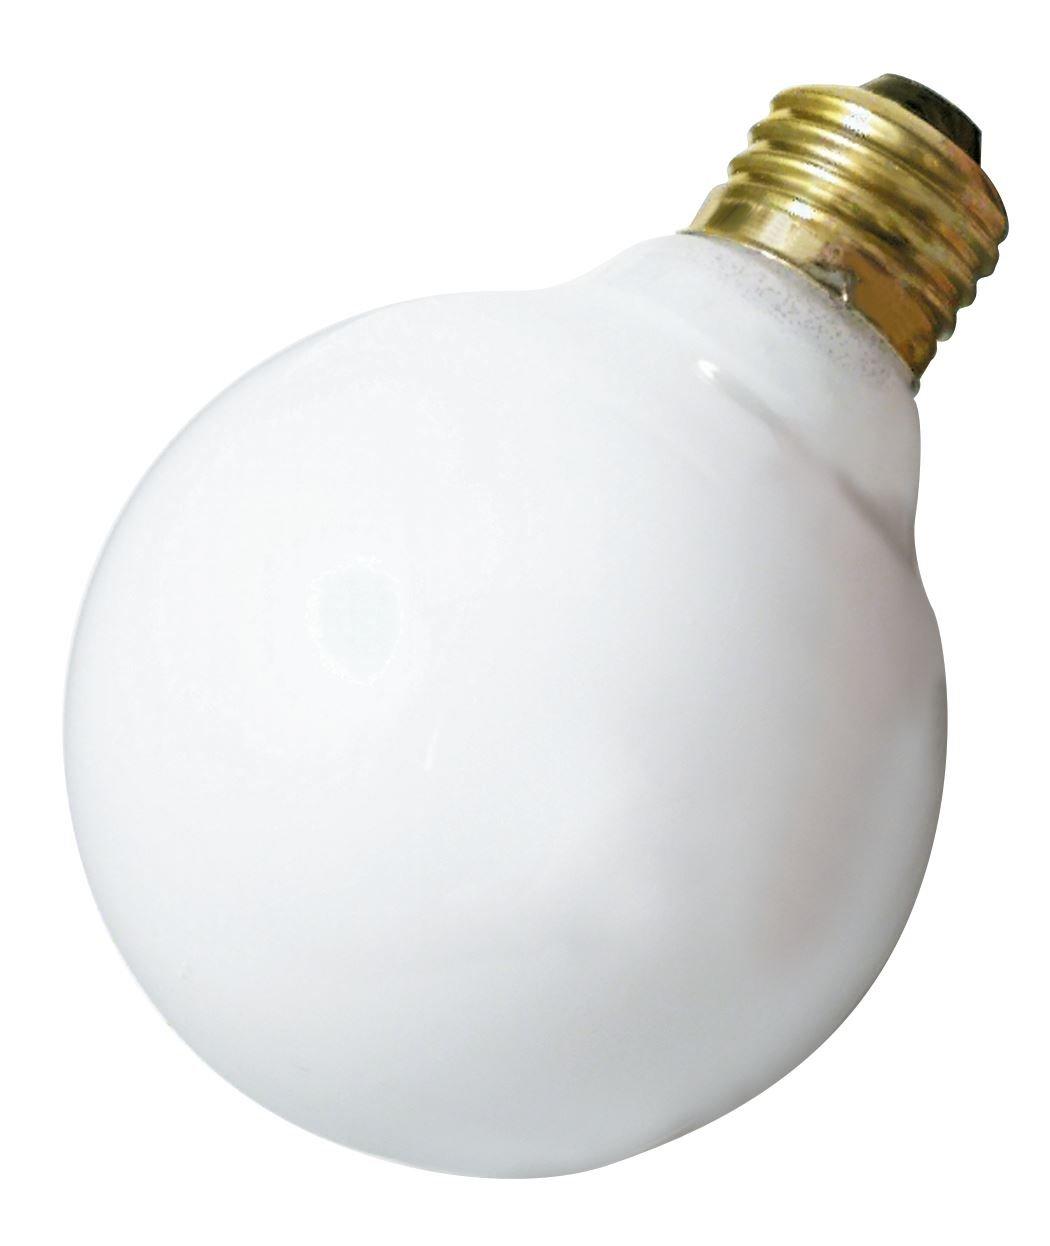 Satco 40G30/W Incandescent Globe Light, 40W E26 G30, Gloss White Bulb [Pack of 6]